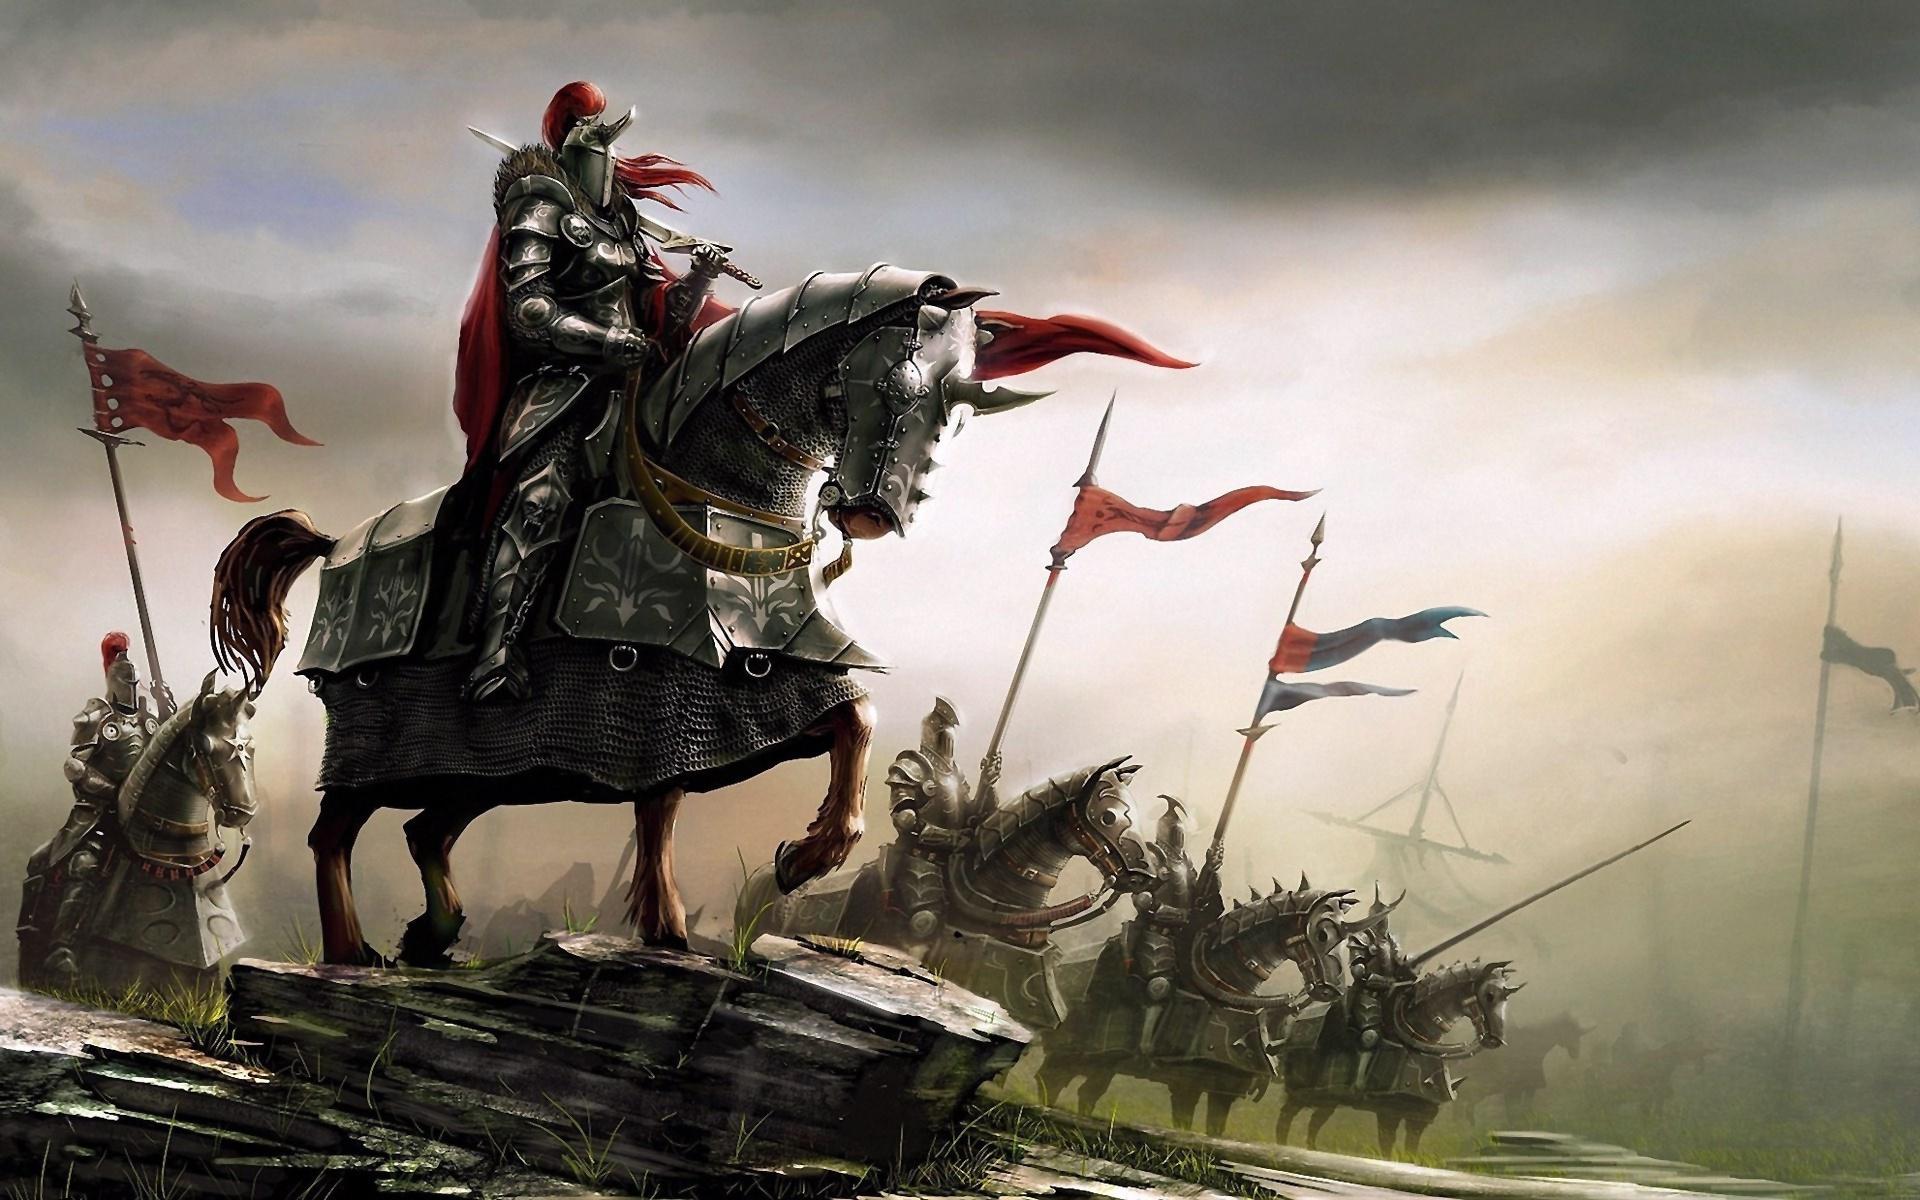 knights-1920x1200.jpg